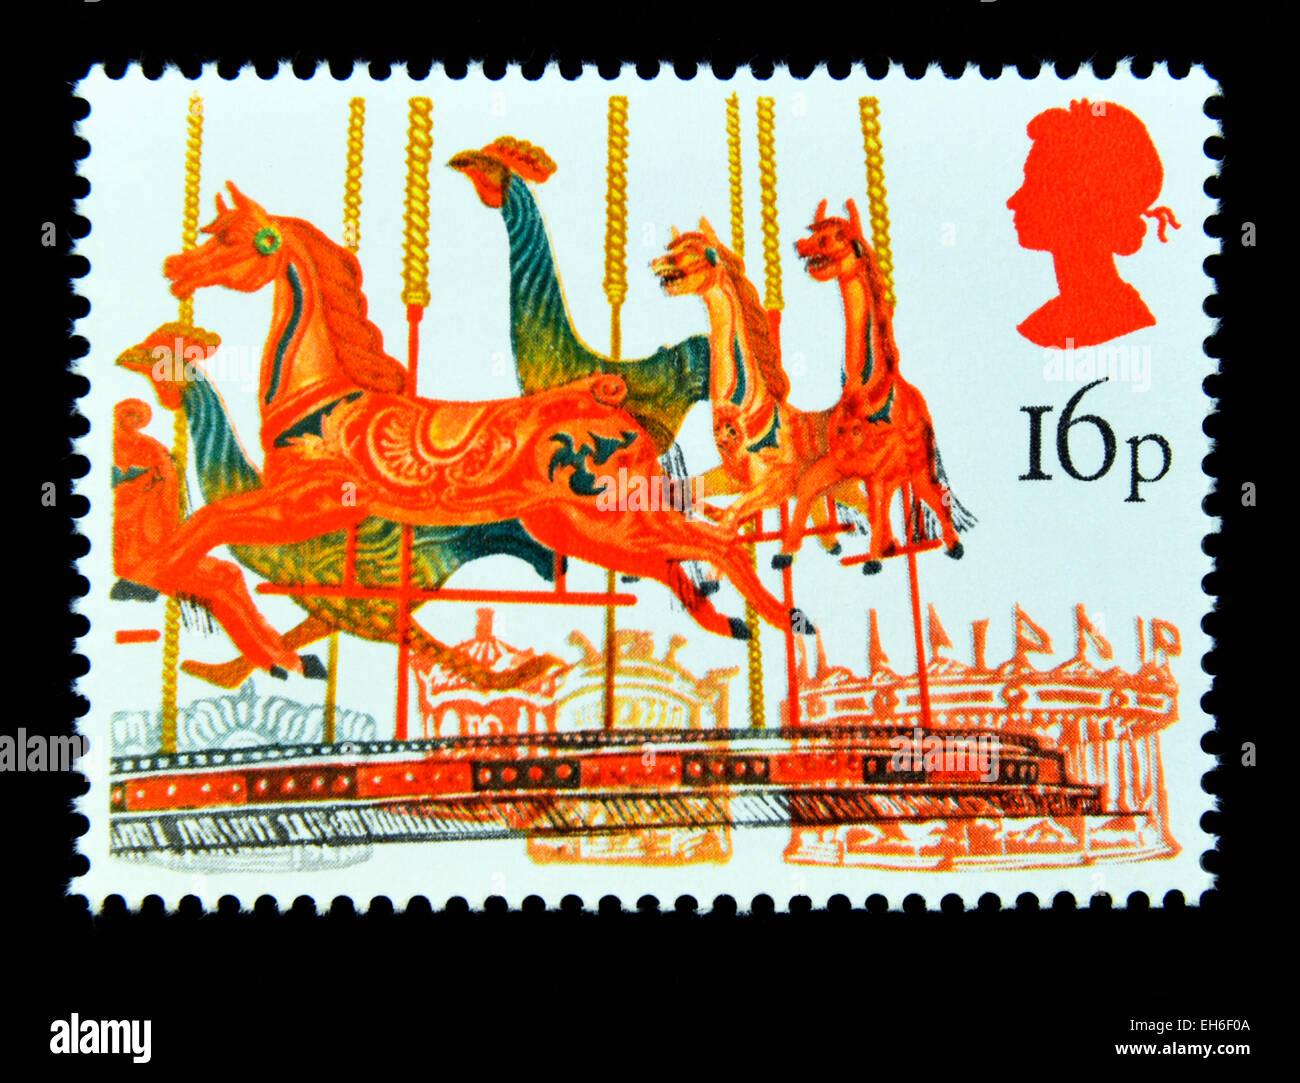 Postage stamp. Great Britain. Queen Elizabeth II. 1983. British Fairs. Merry-go-round. 16p. - Stock Image